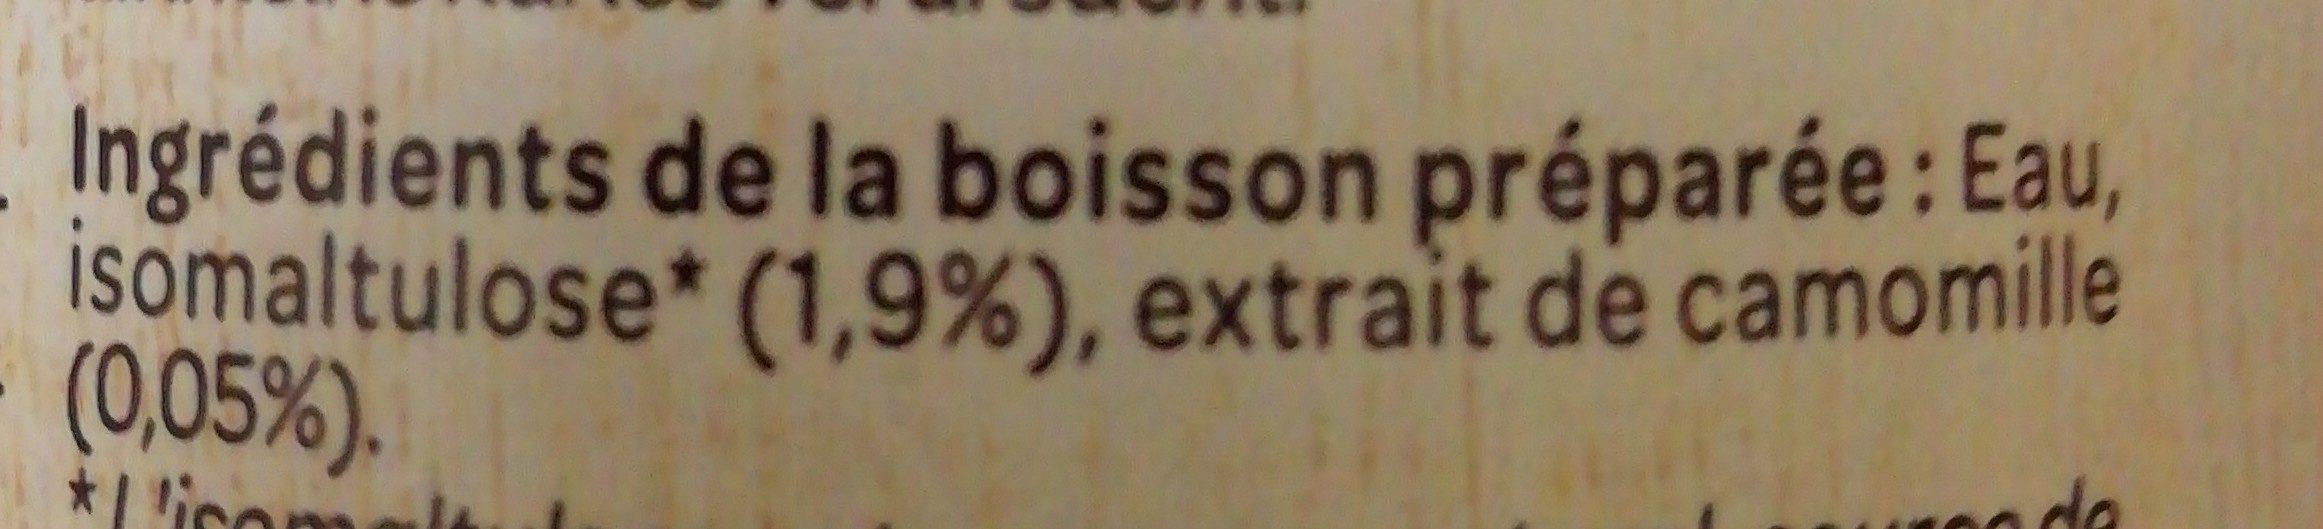 Boisson Camomille - Ingredients - fr